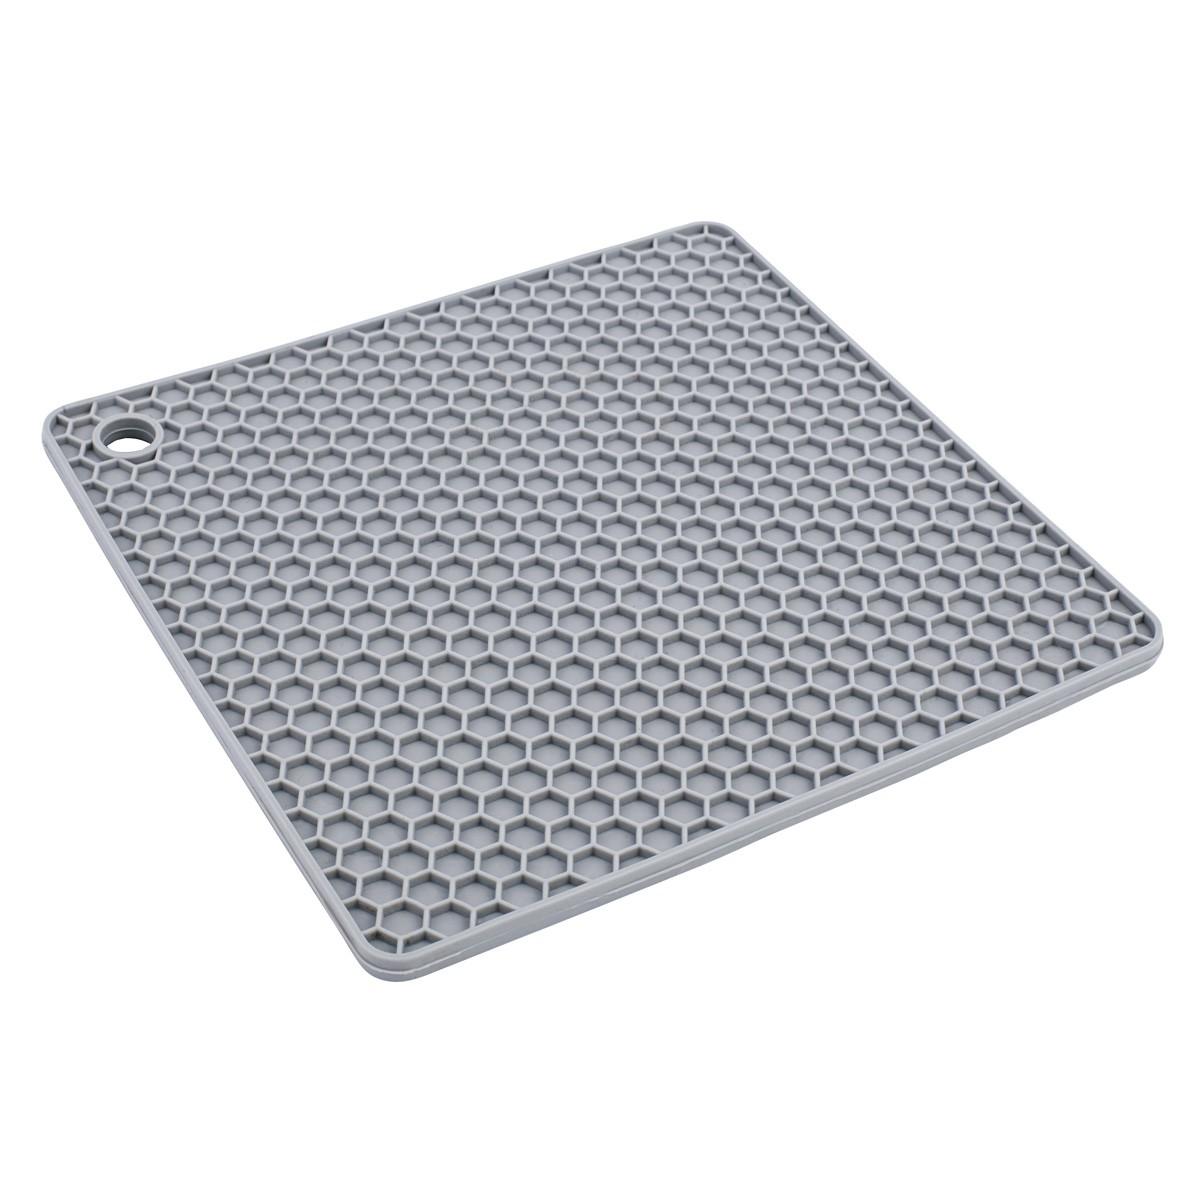 Descanso para Panela de Silicone Quadrado Cinza 24Cm